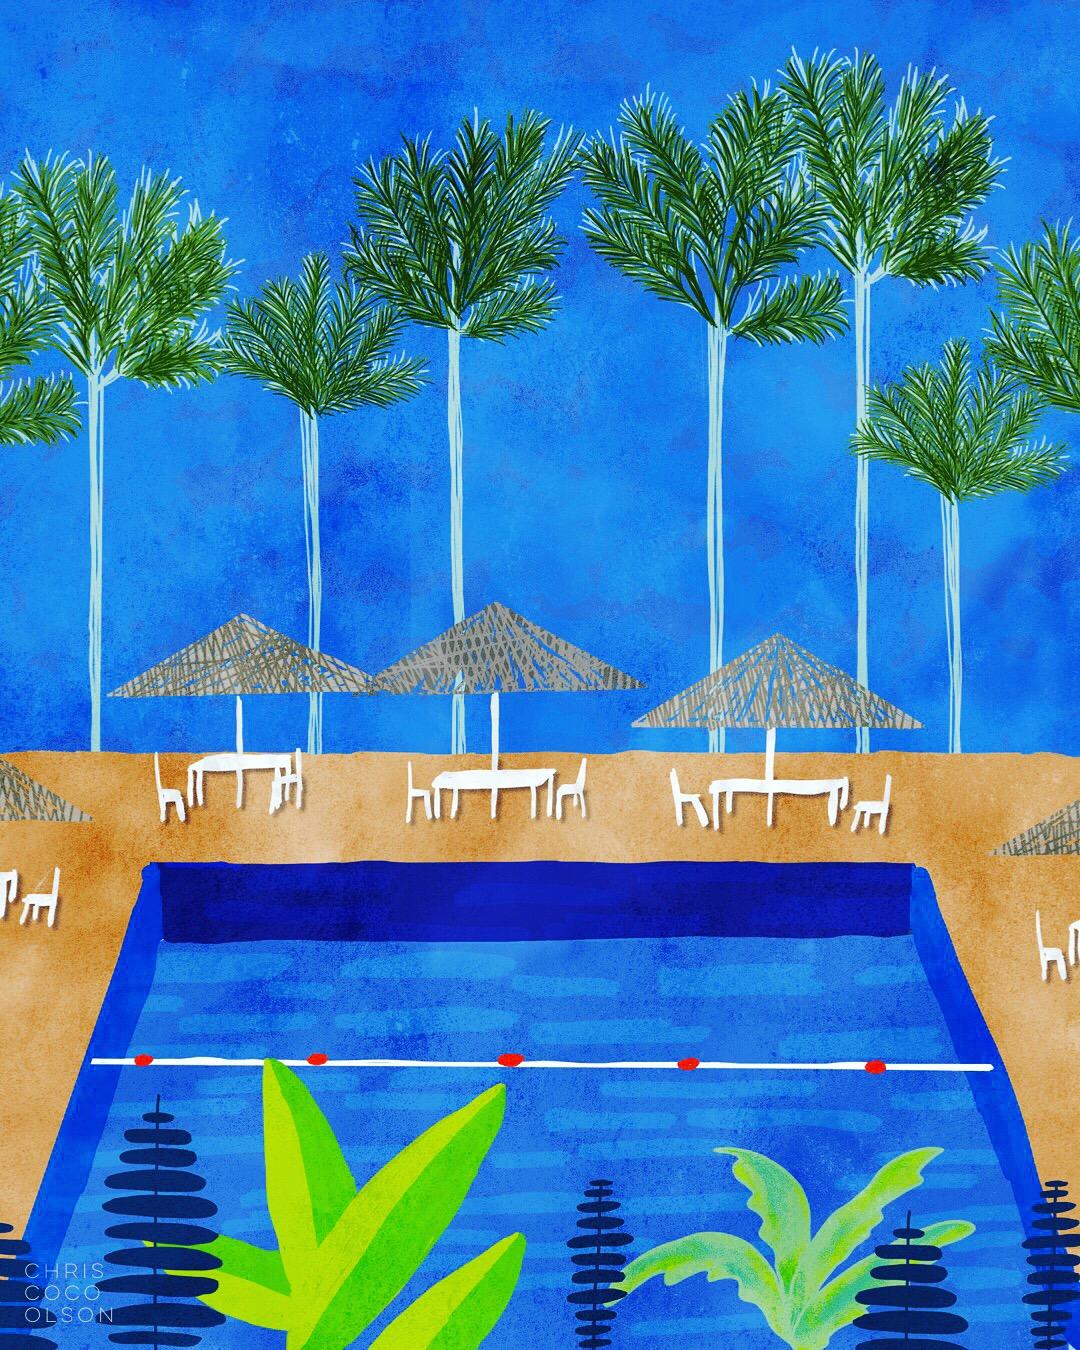 Pool illustration by Chris Olson.